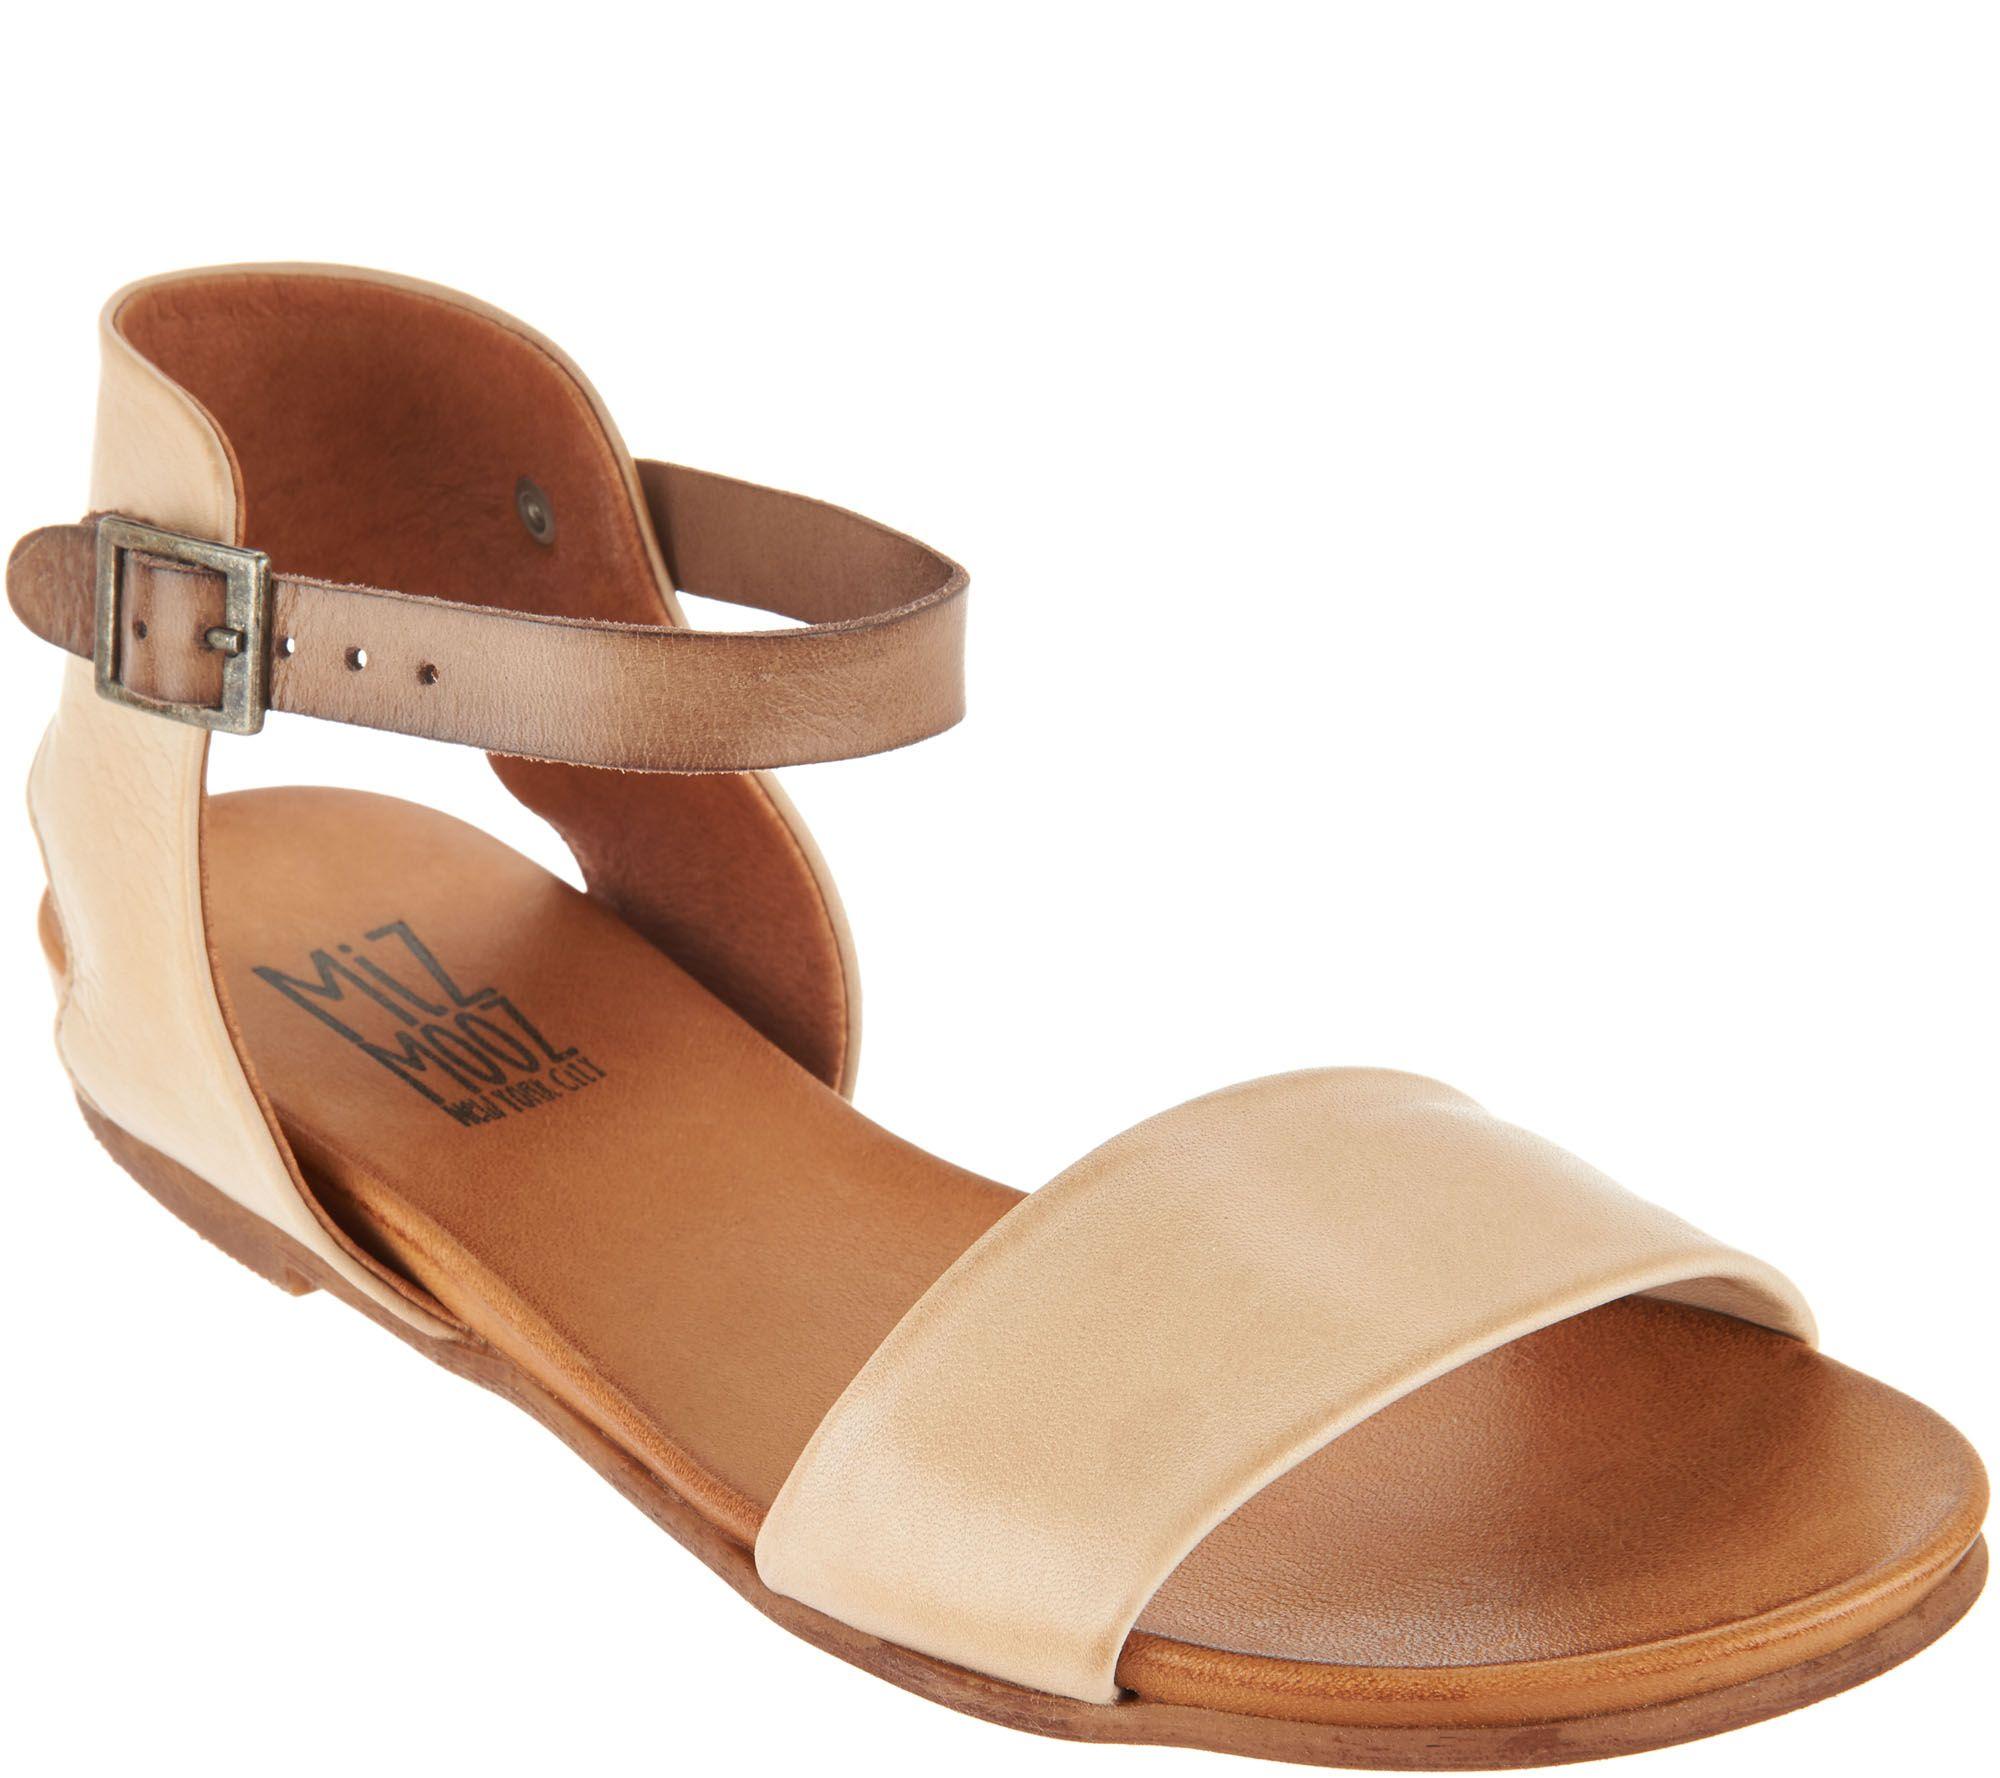 Miz Mooz Leather Ankle Strap Sandals Alanis Page 1